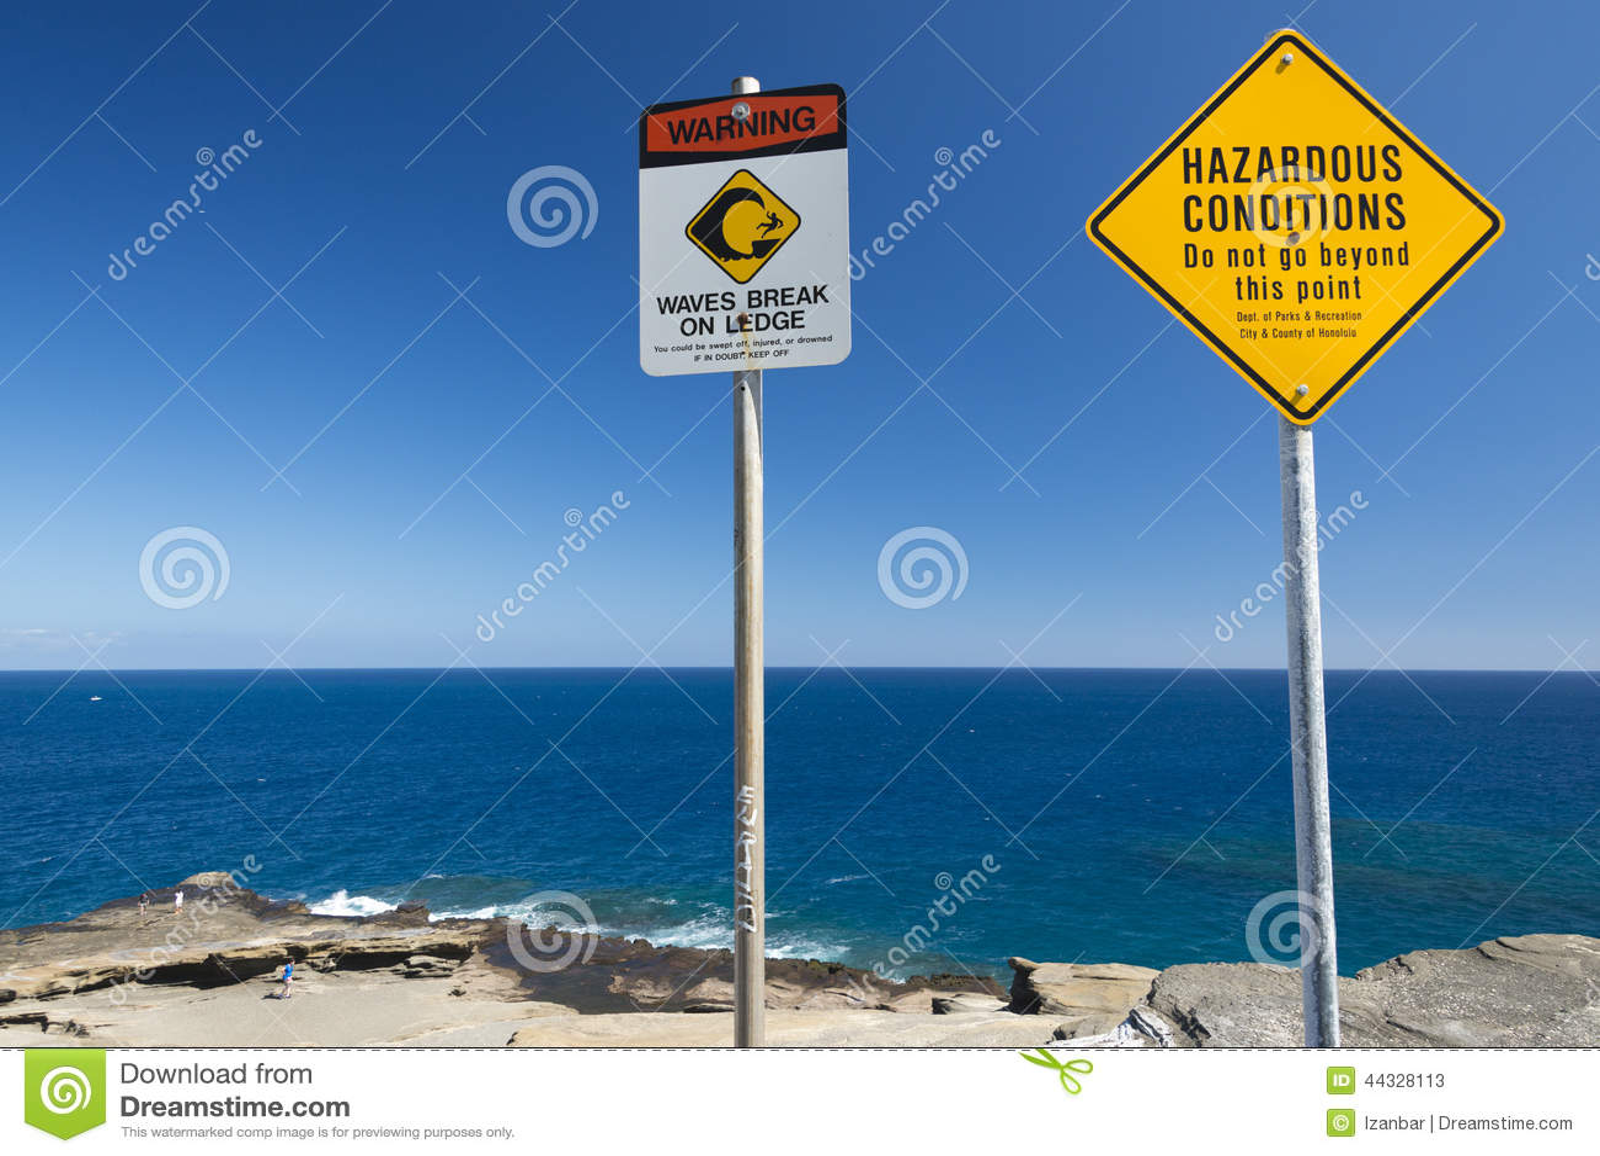 No swimming danger sign in hawaii